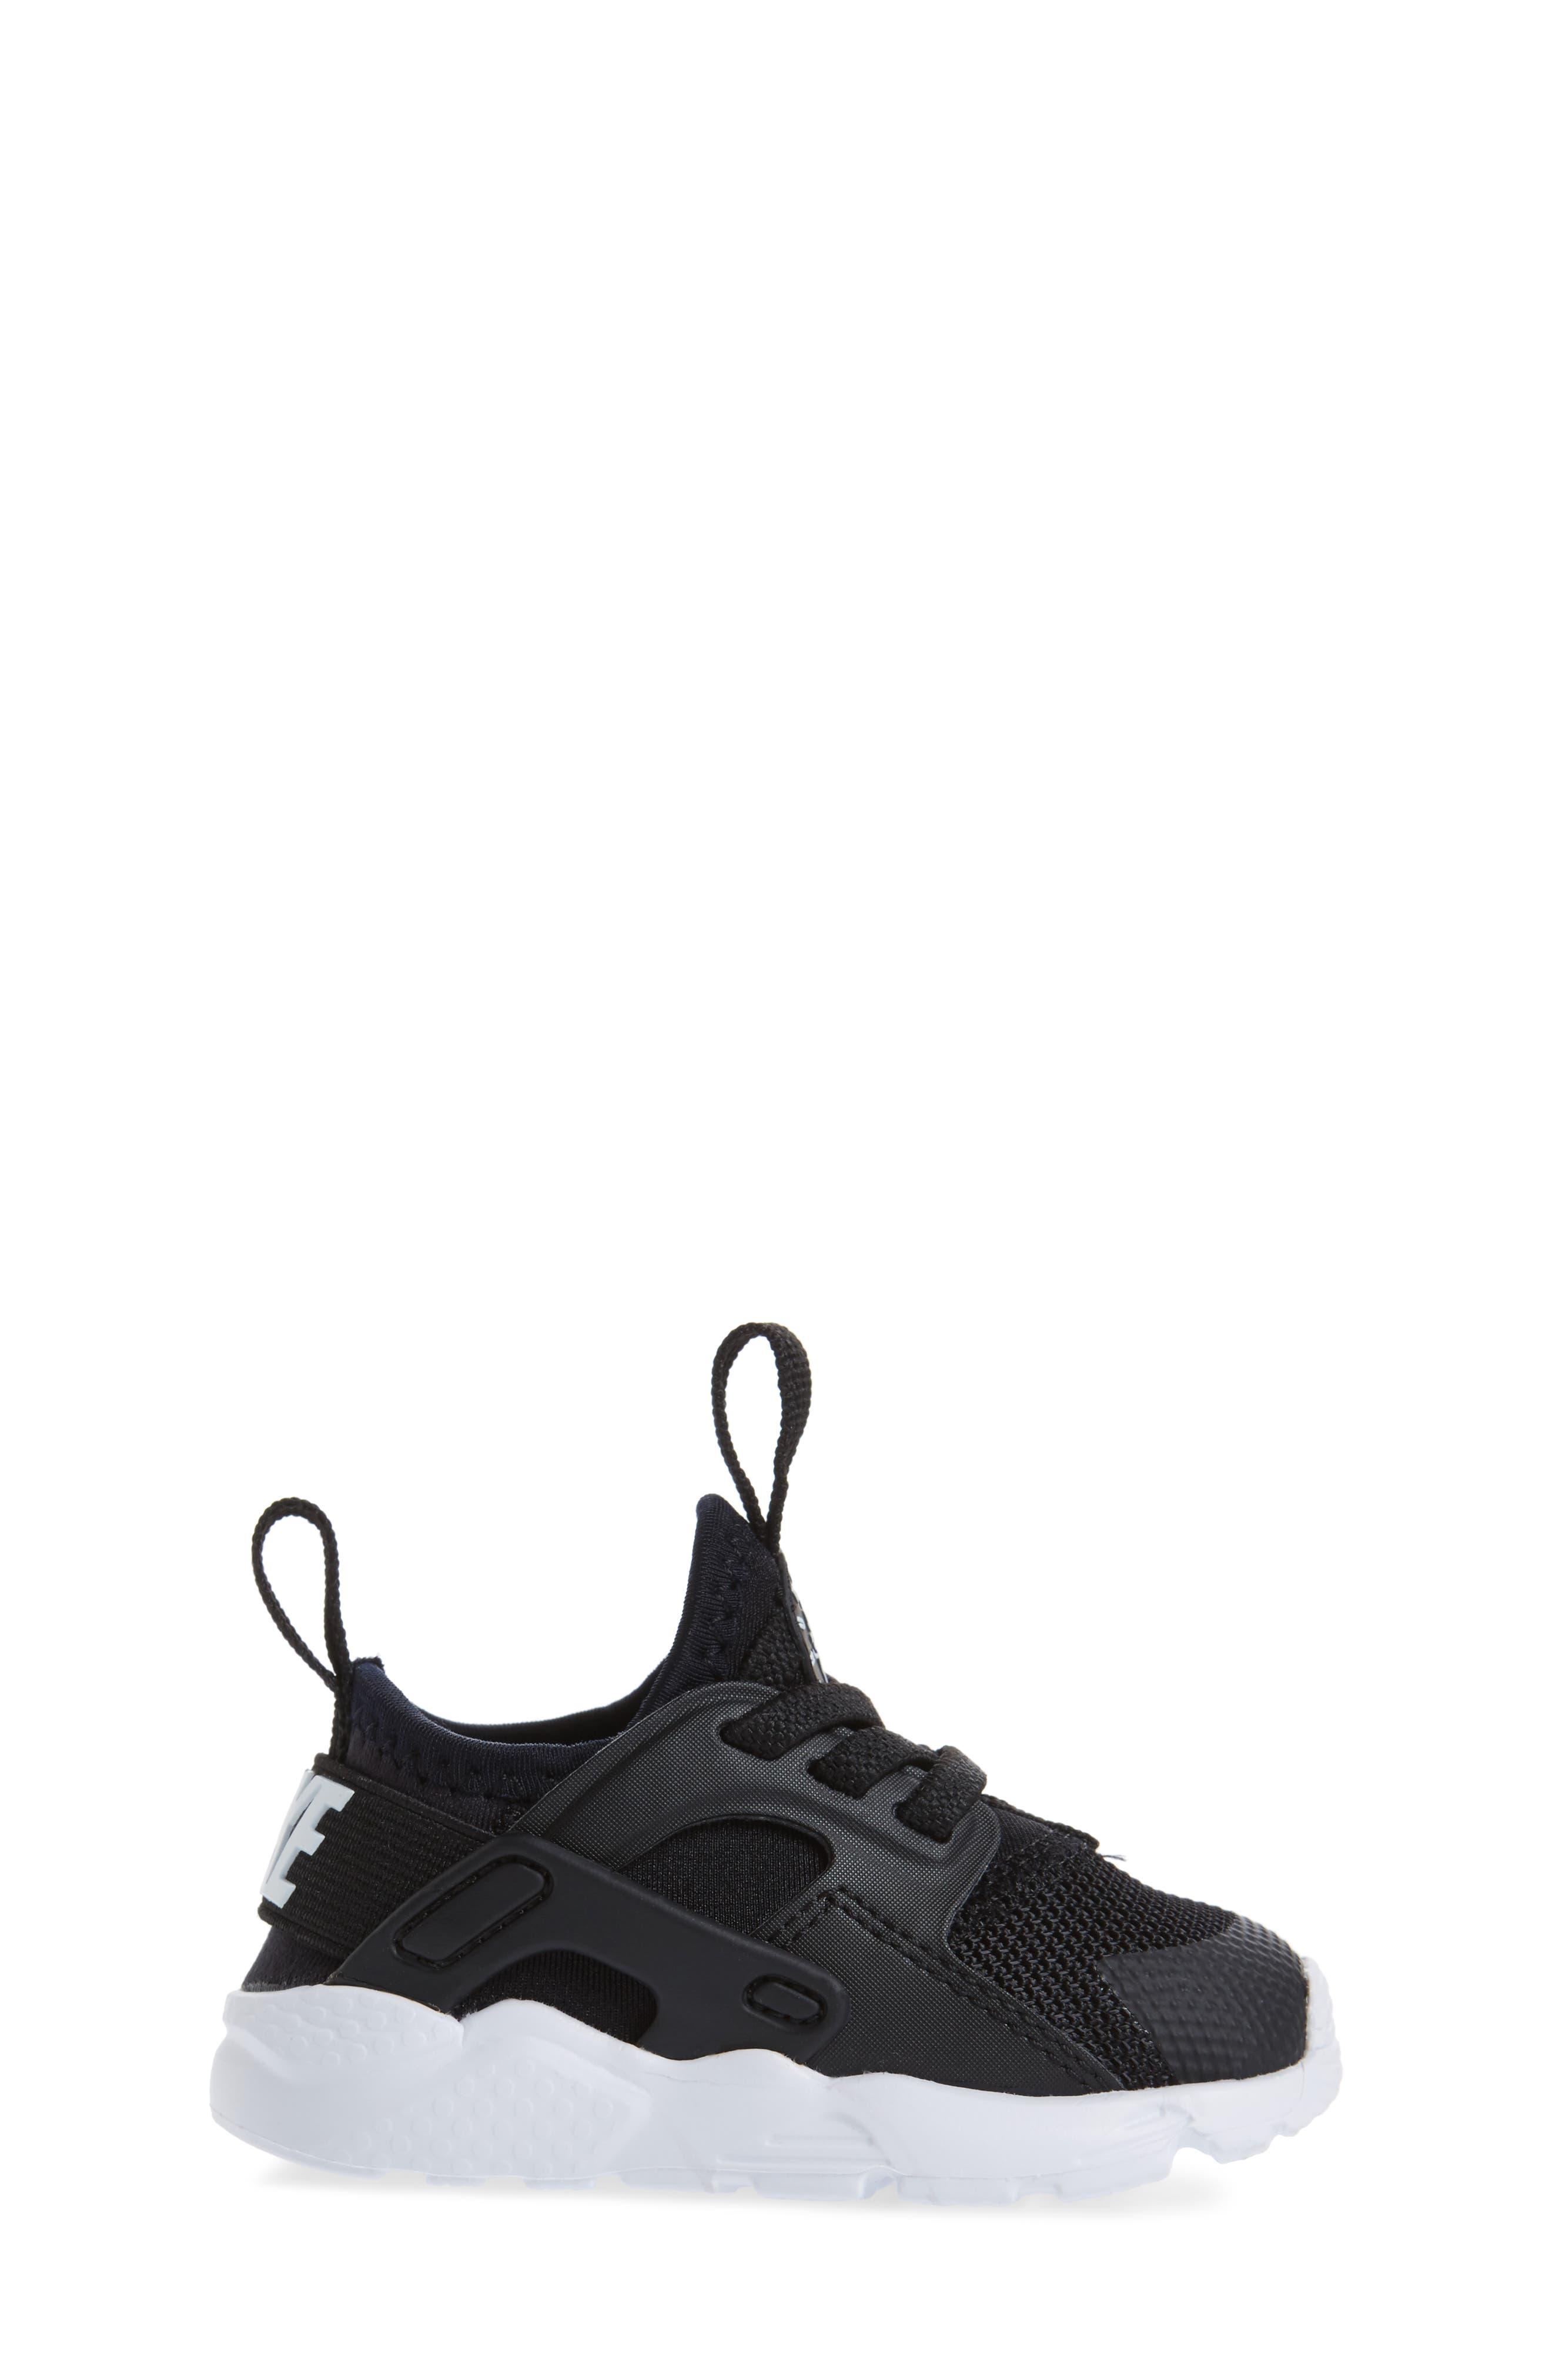 Air Huarache Run Ultra Sneaker,                             Alternate thumbnail 3, color,                             Black/ Black/ White